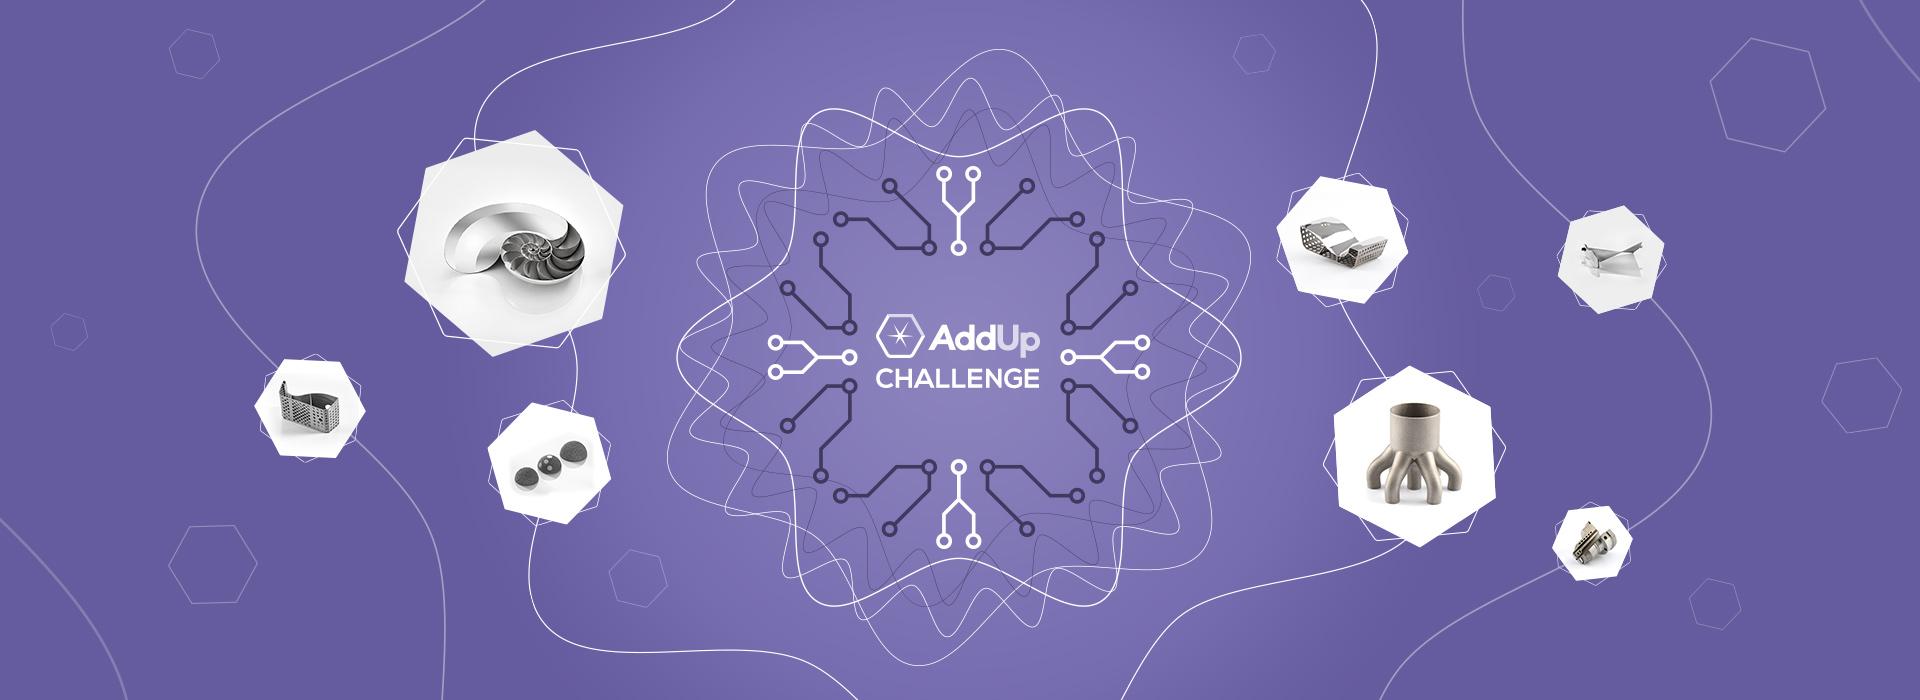 AddUp Challenge